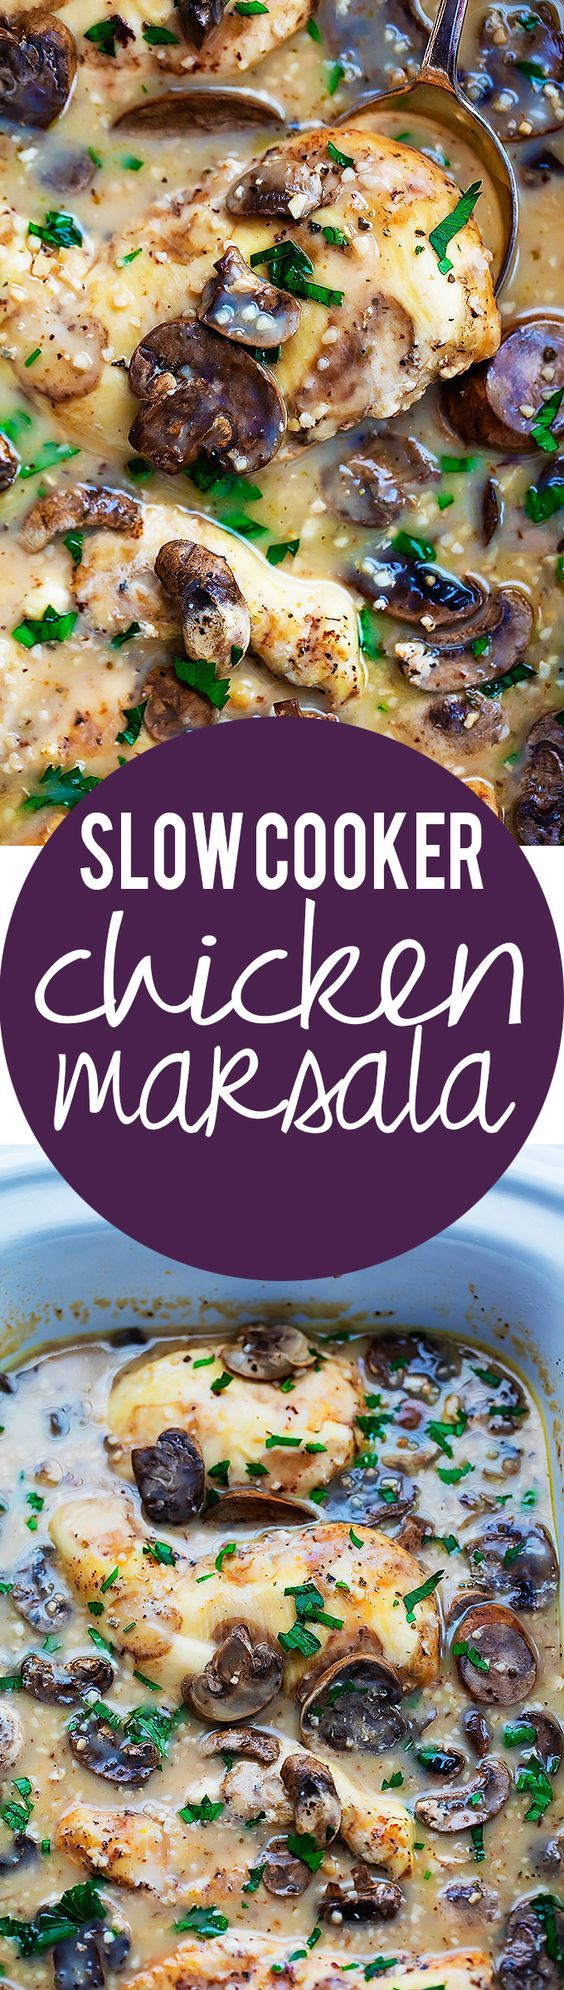 Slow Cooker Chicken Marsala | Creme de la Crumb: